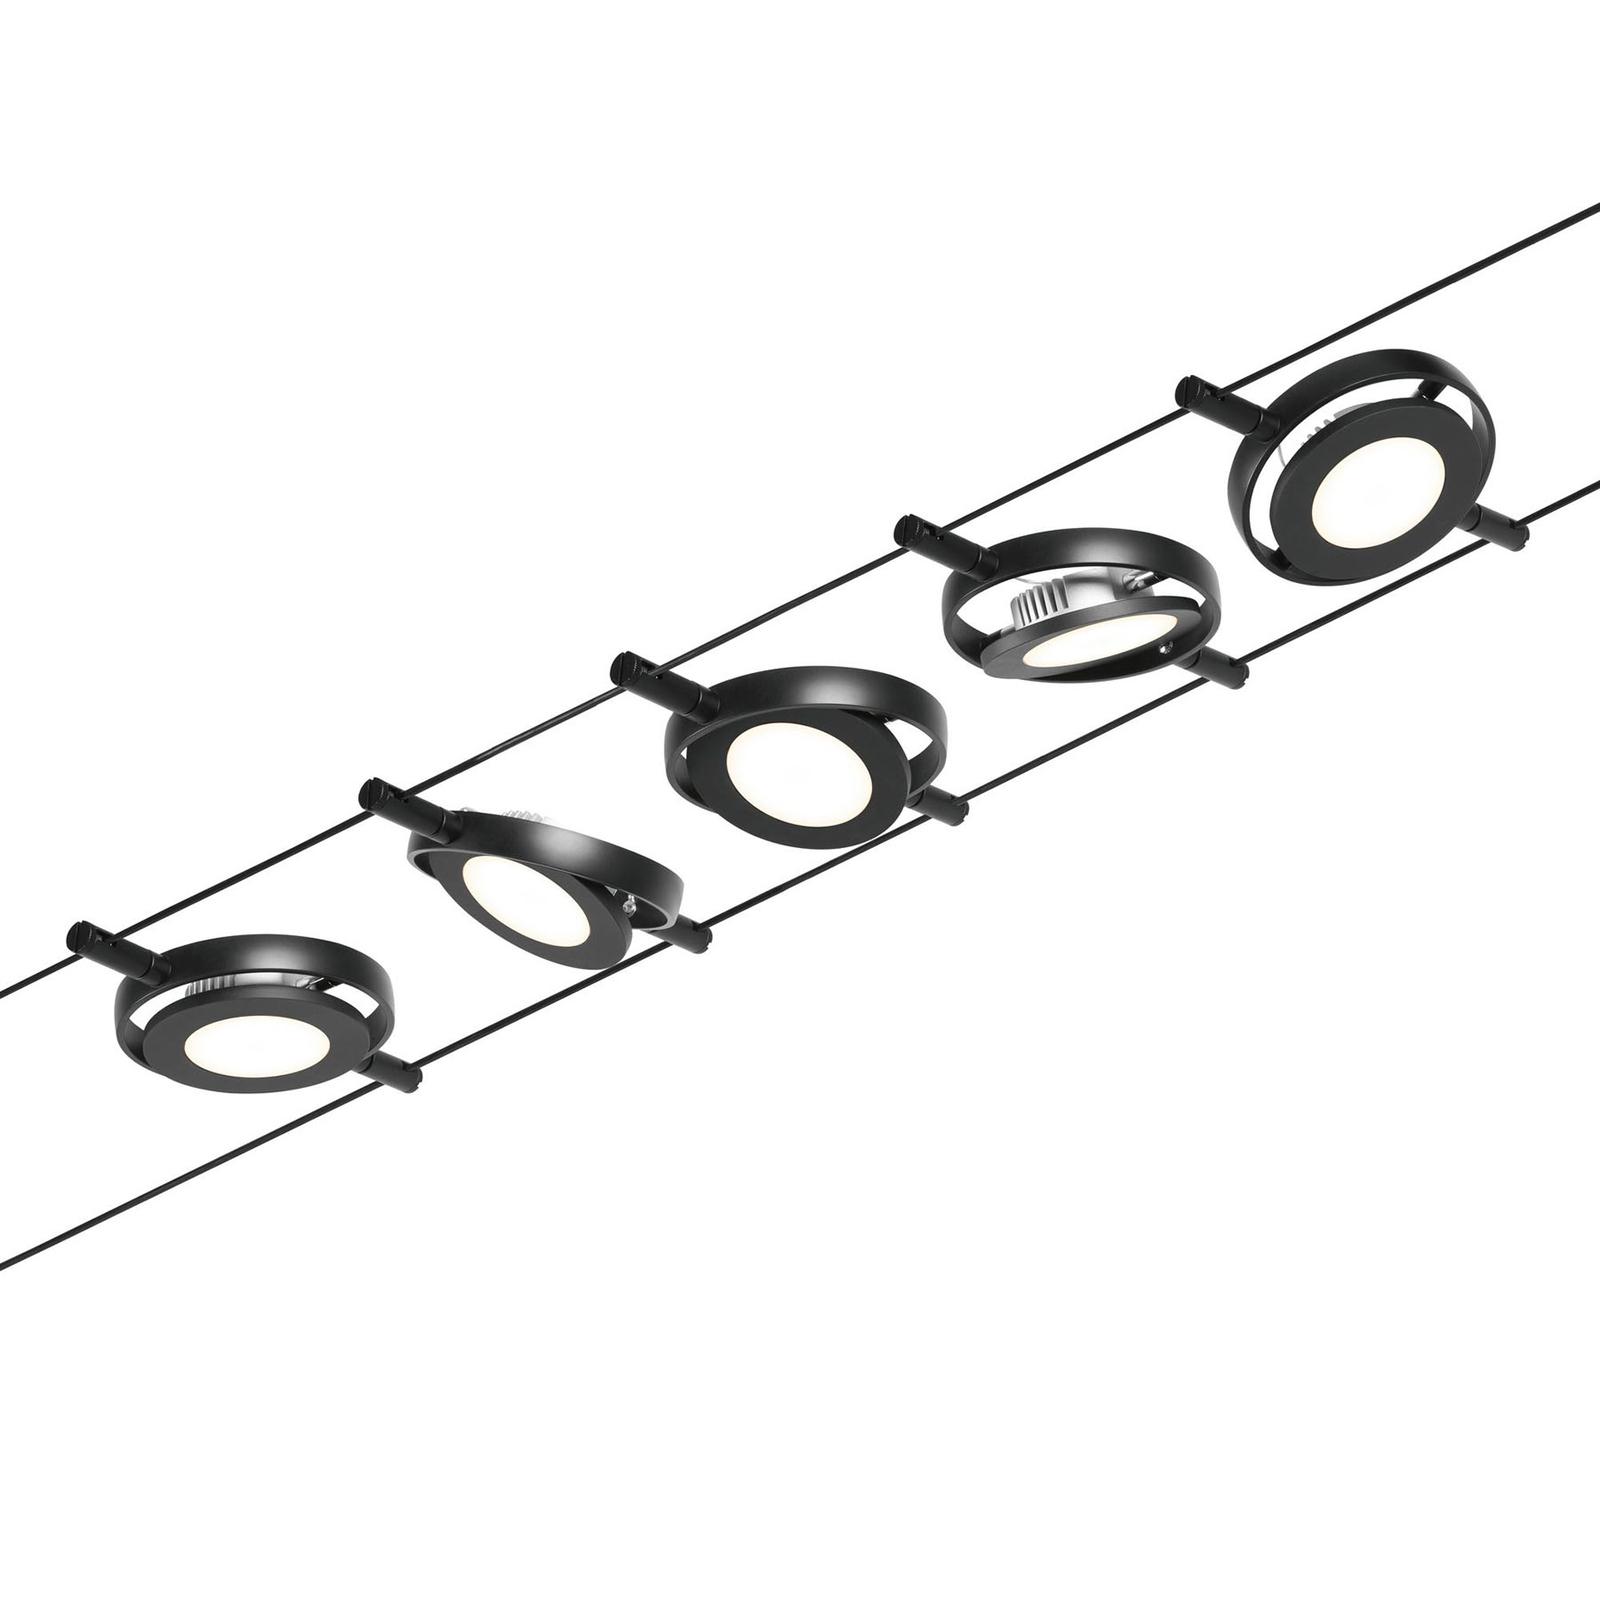 Paulmann Wire RoundMac funi LED 5 luci nero